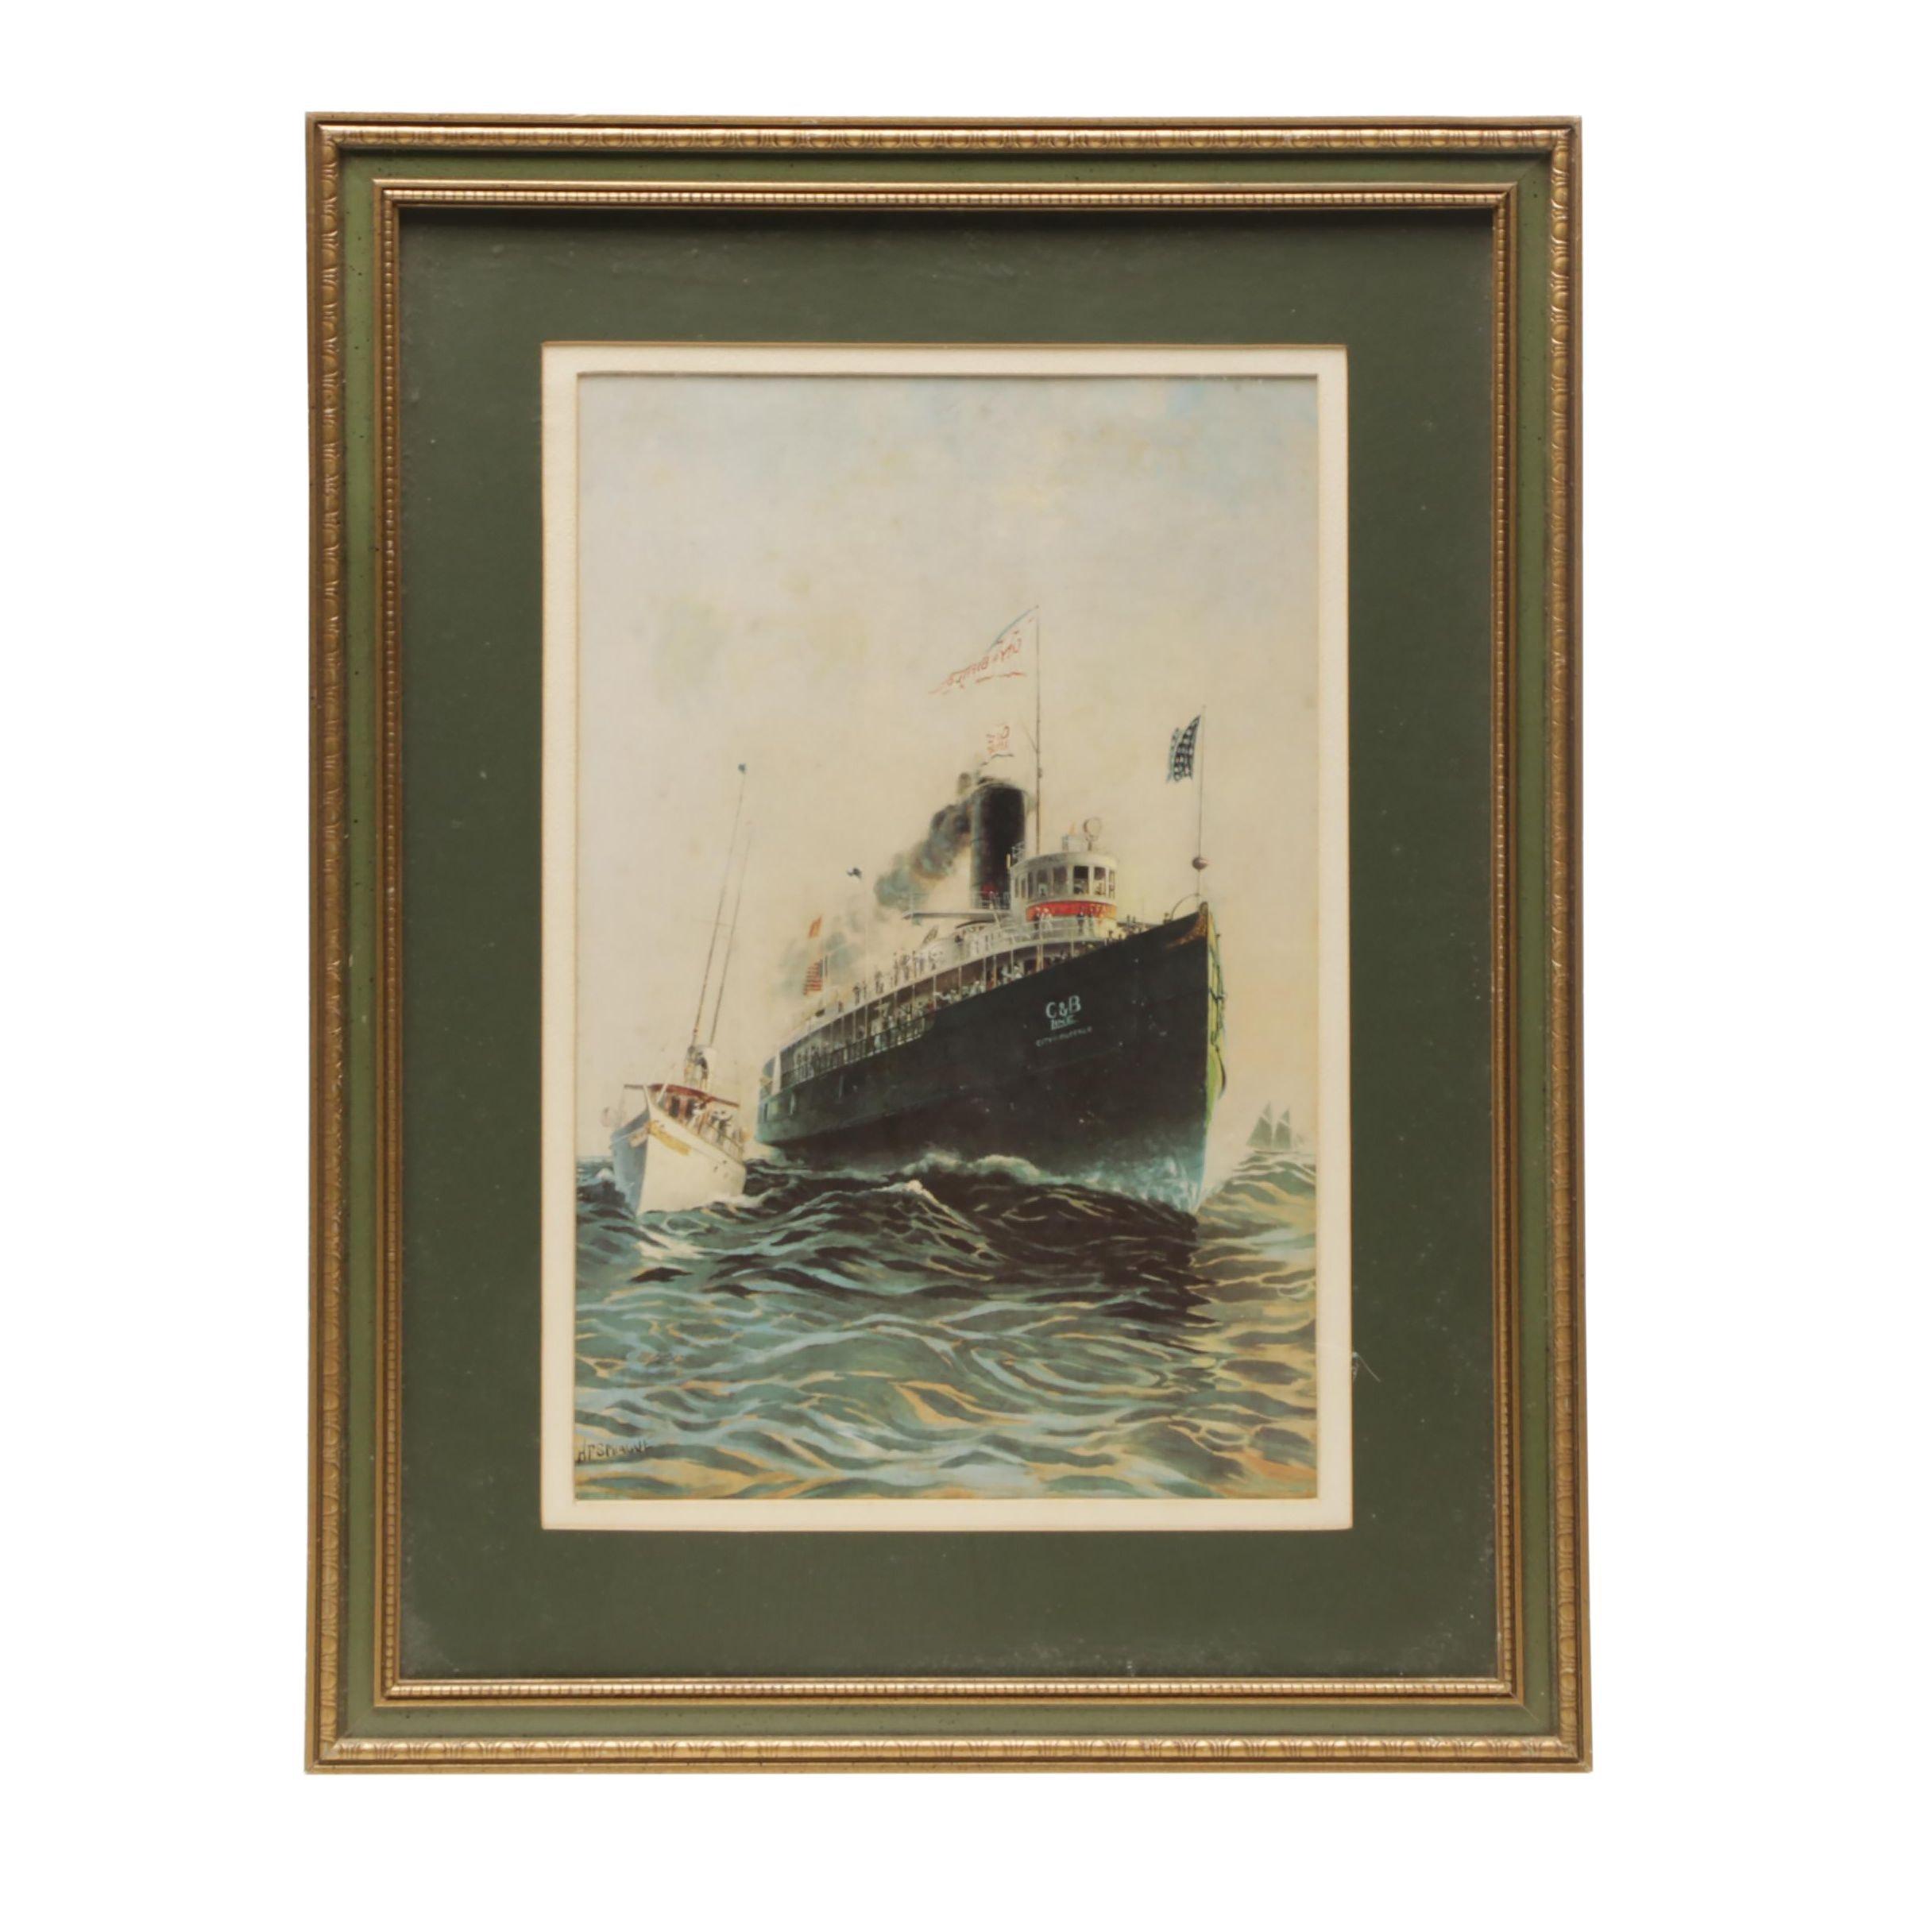 Offset Lithograph After Howard Freeman Sprague C & B Line Ship